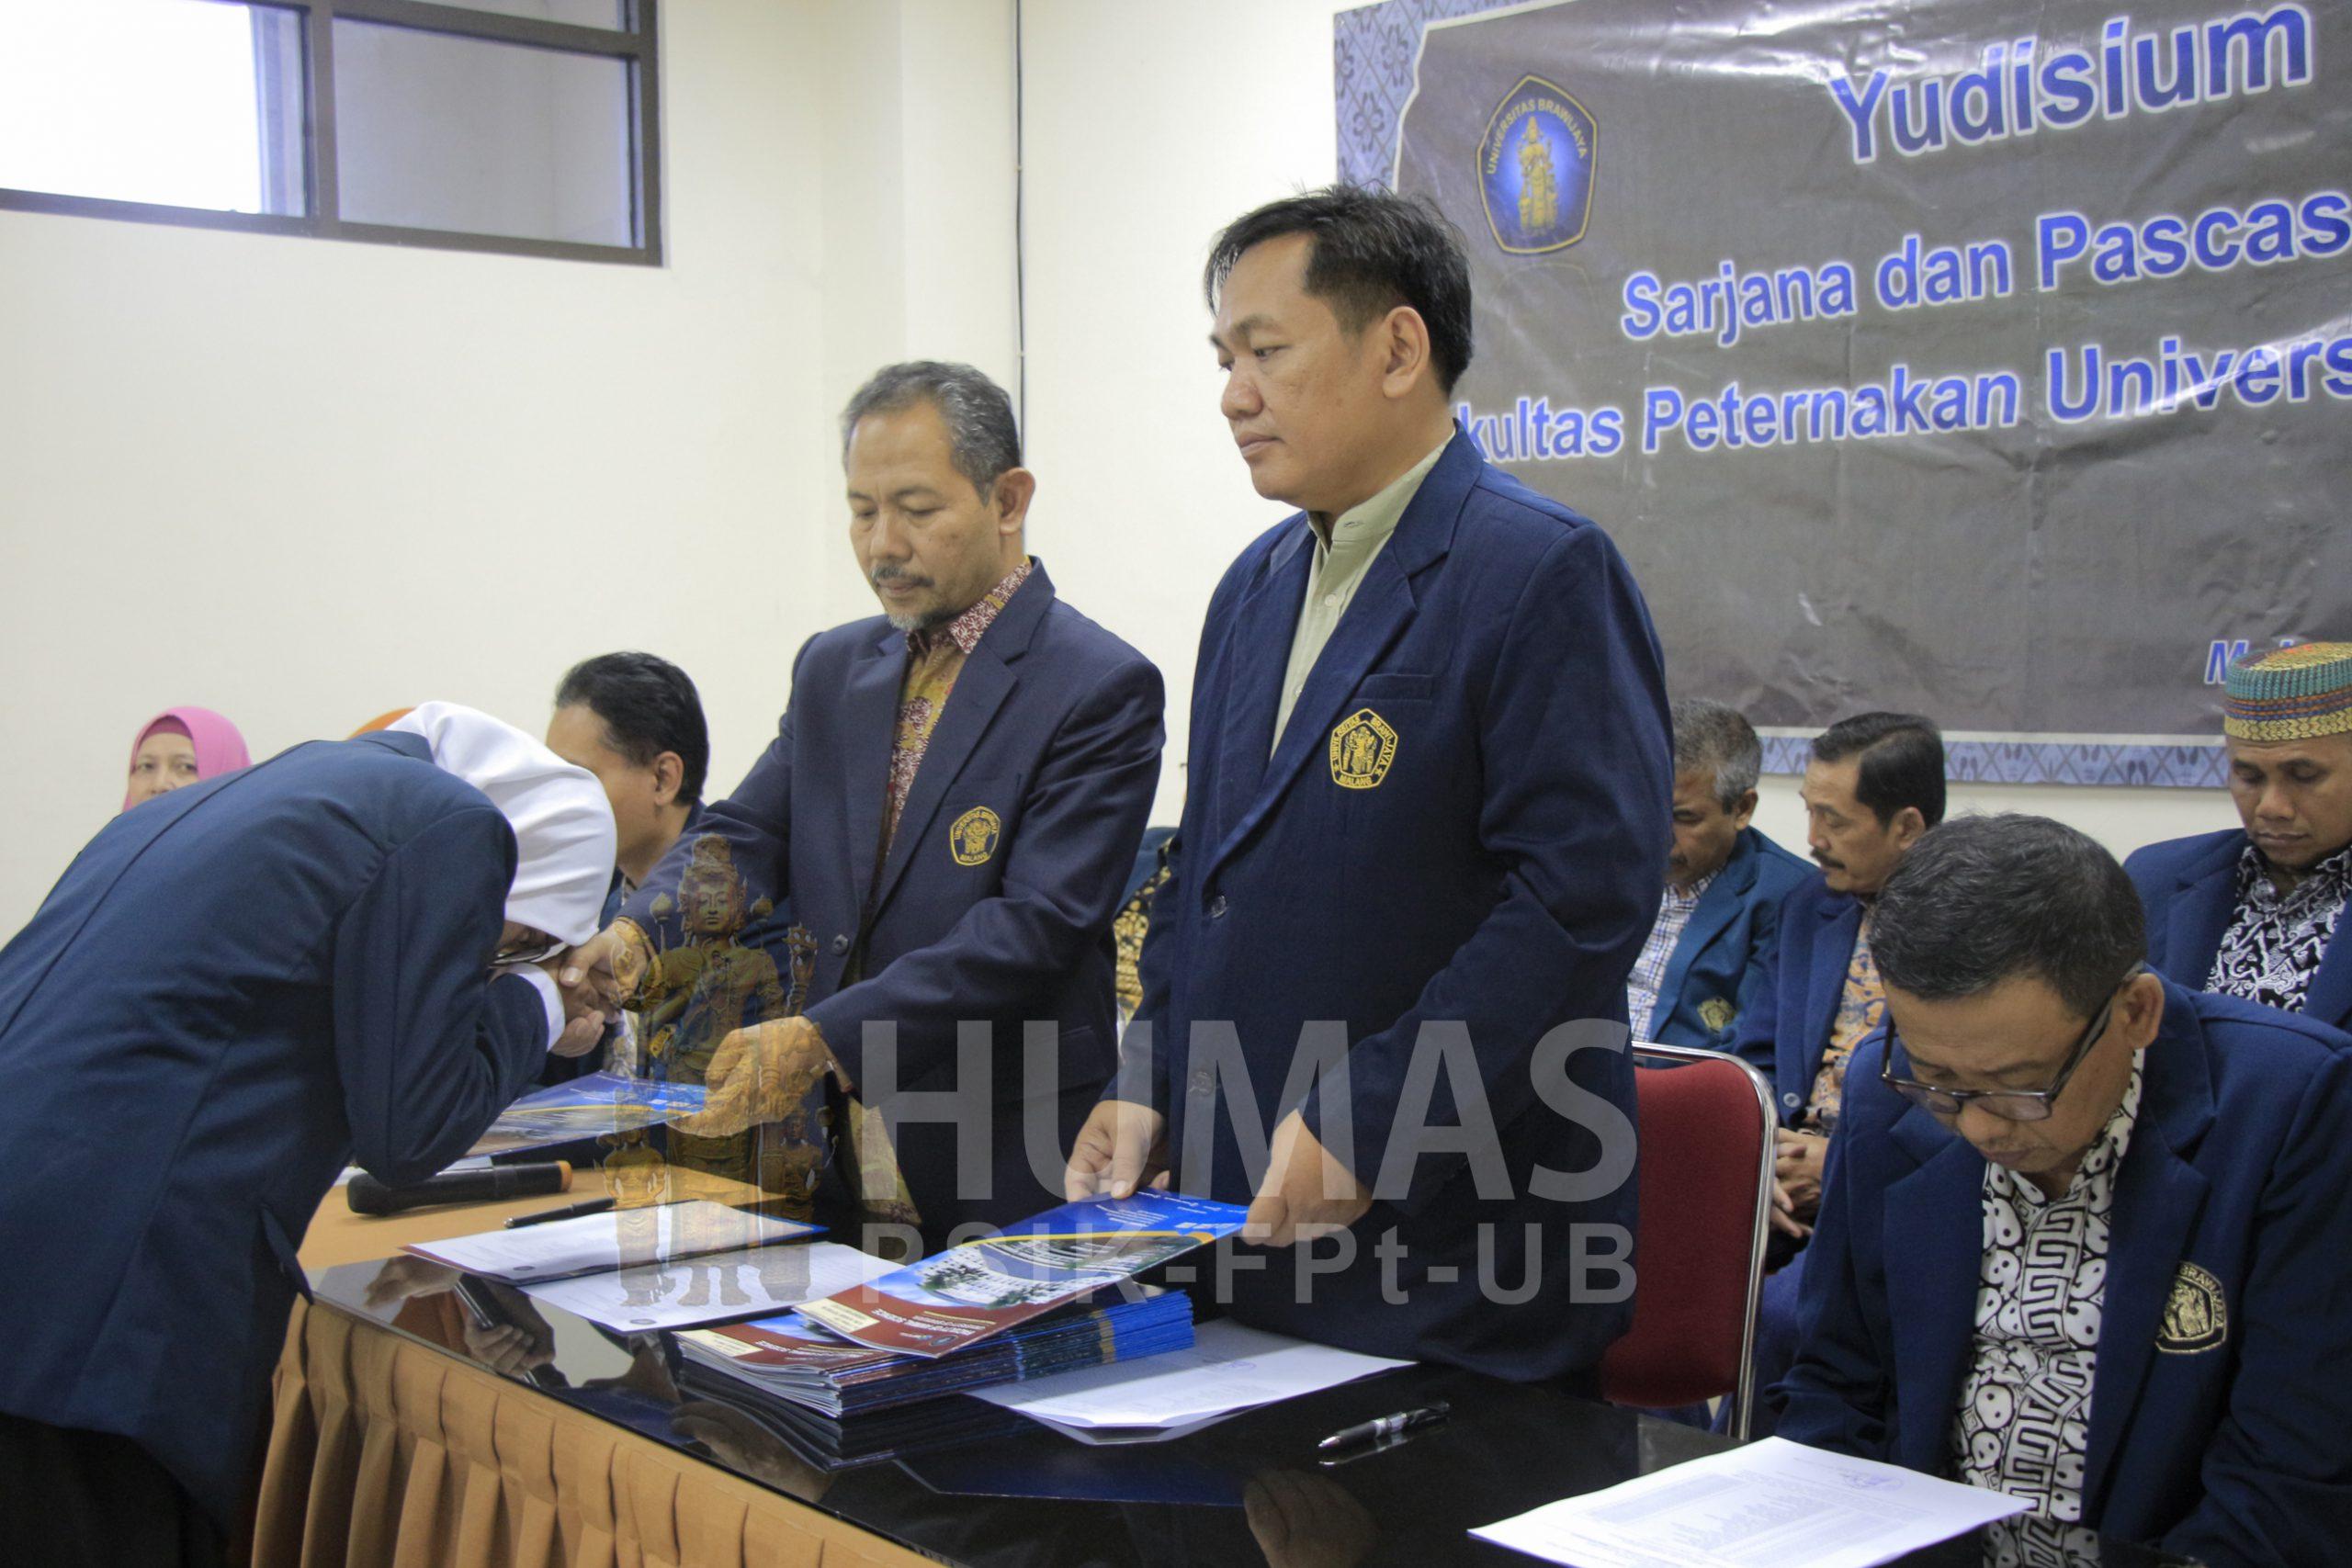 Yudisium Program Sarjana Periode III Semester Ganjil TA. 2019/2020